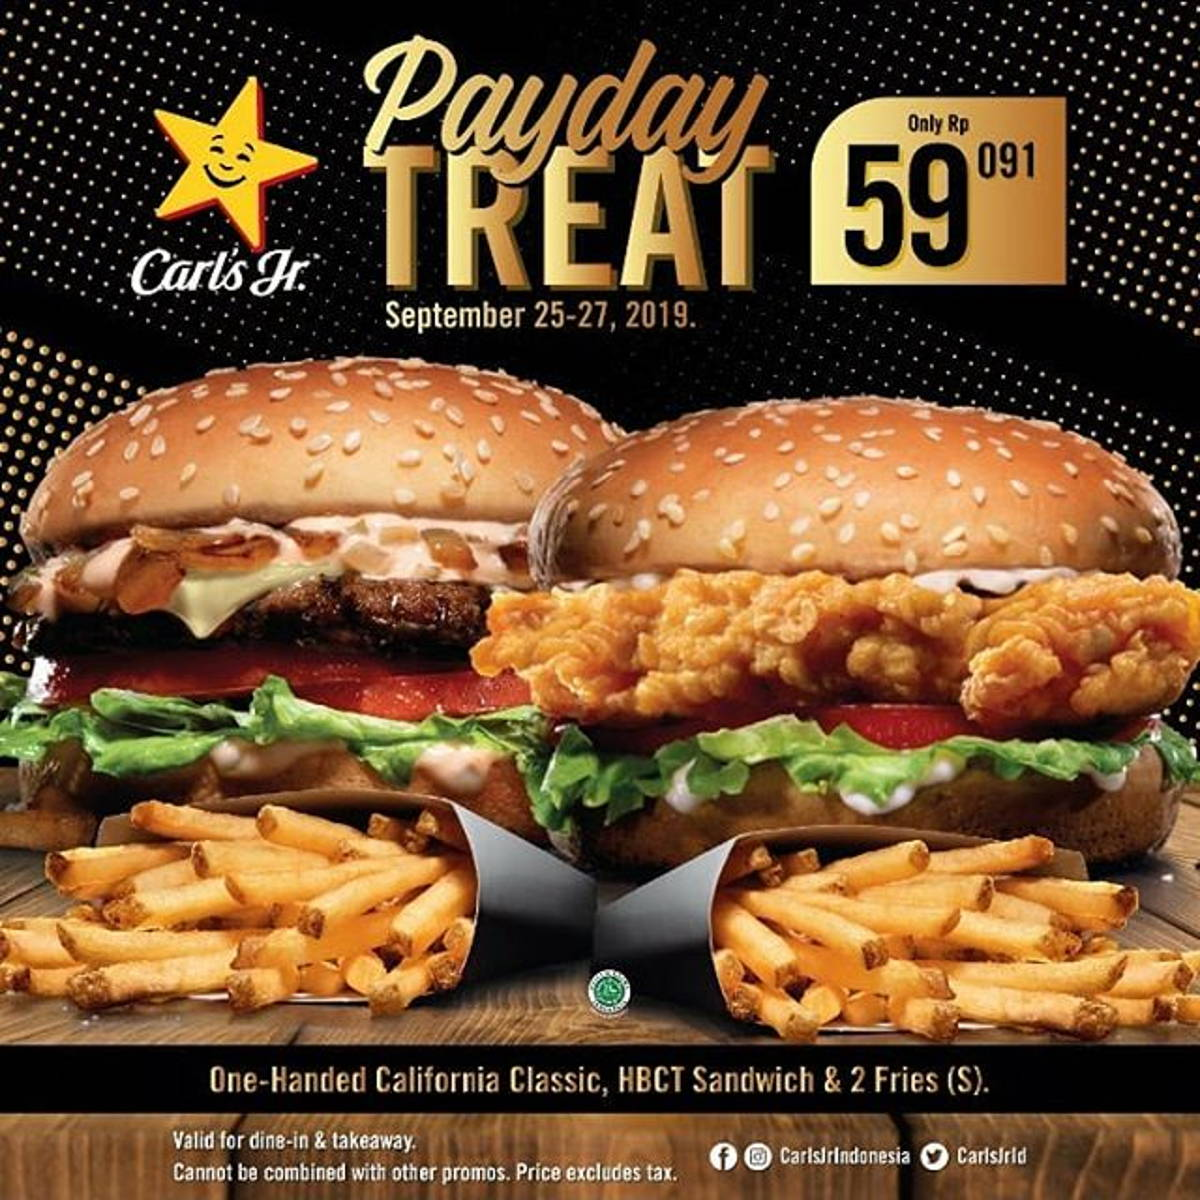 Katalog Promo: Carl's Jr.: PROMO hemat 2 Burger (One-Handed California Classic + Hand-Breaded Chicken Tender Sandwich) + 2 Fries (S) HANYA dengan Rp. 59,091 - 1